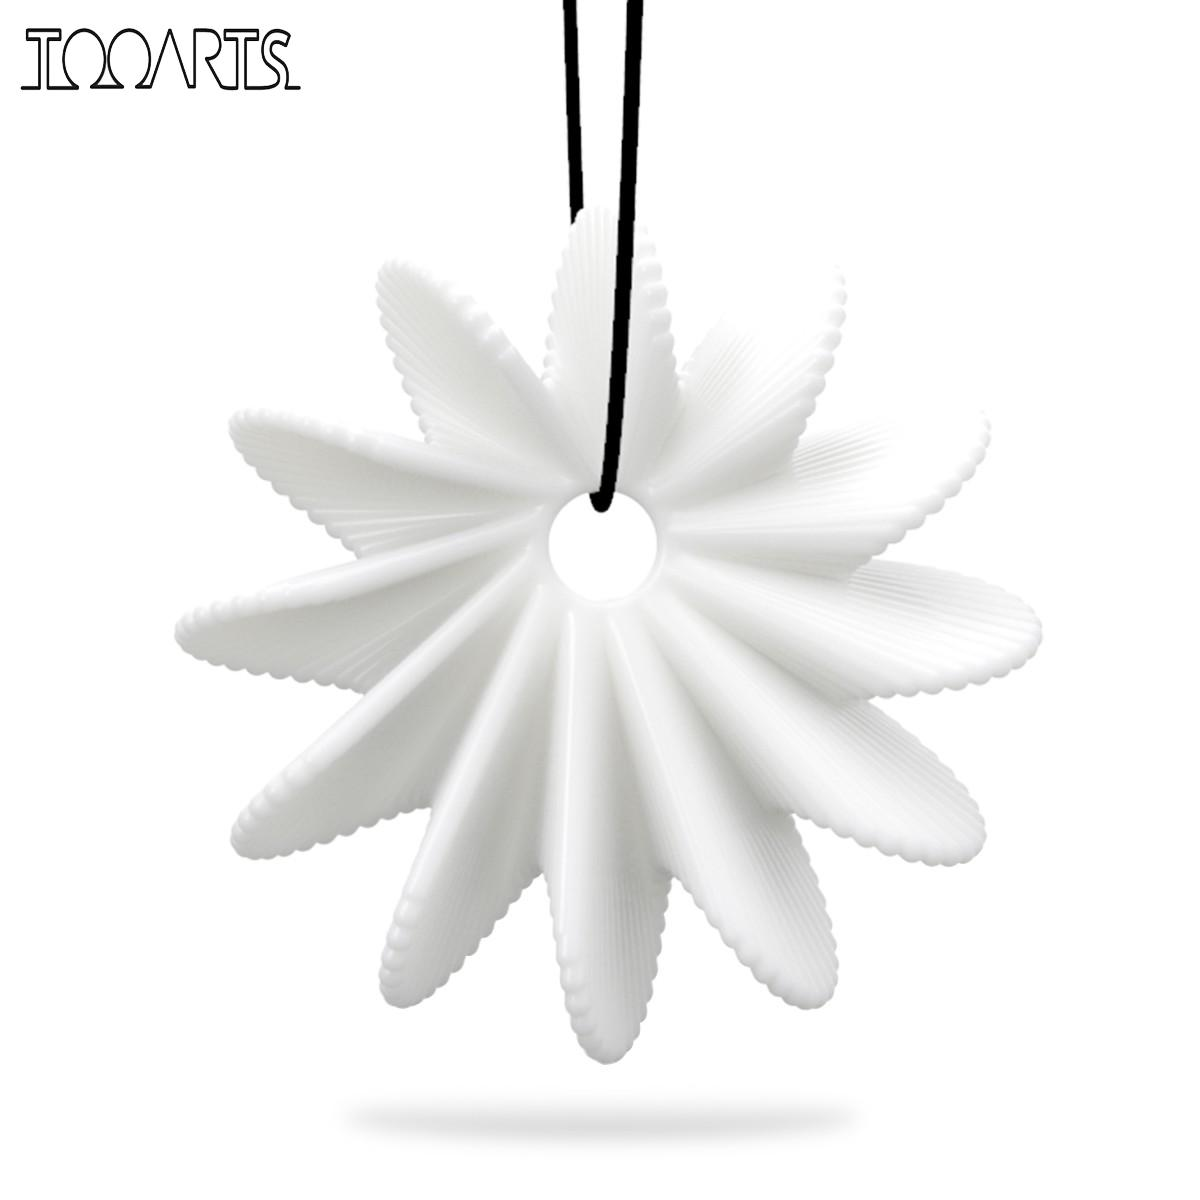 Tooarts Tomfeel 3D 인쇄 보석 개화 꽃 우아한 모델링 - 가정 장식